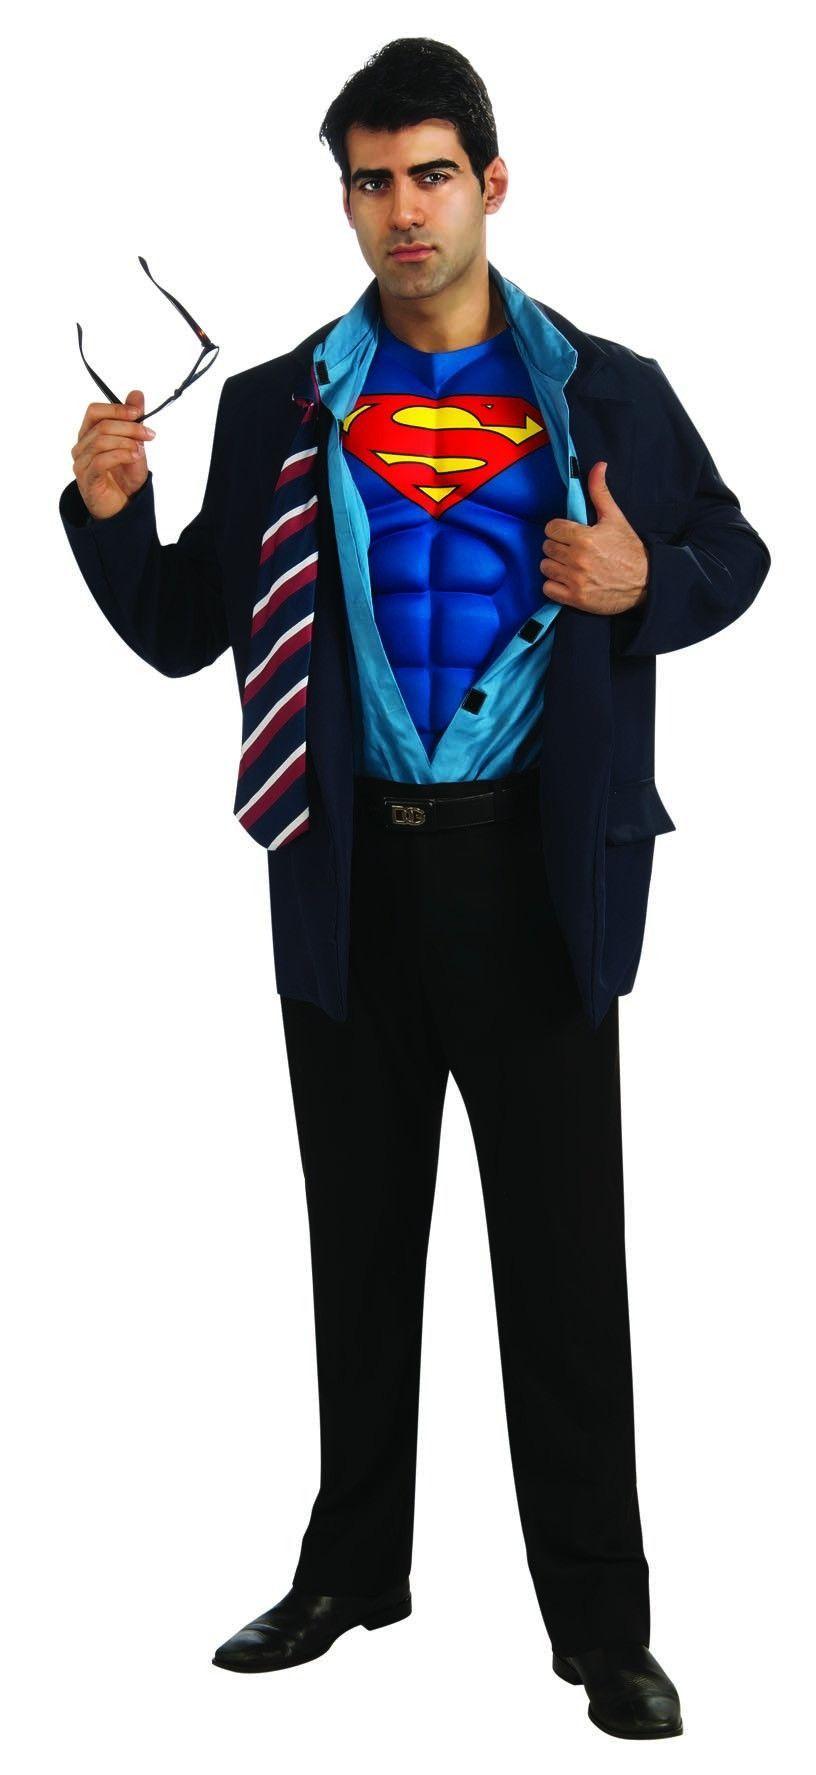 Superman / Clark Kent Muscle Chest Costume Jacket Adult  sc 1 st  Pinterest & Superman / Clark Kent Muscle Chest Costume Jacket Adult | Clark kent ...